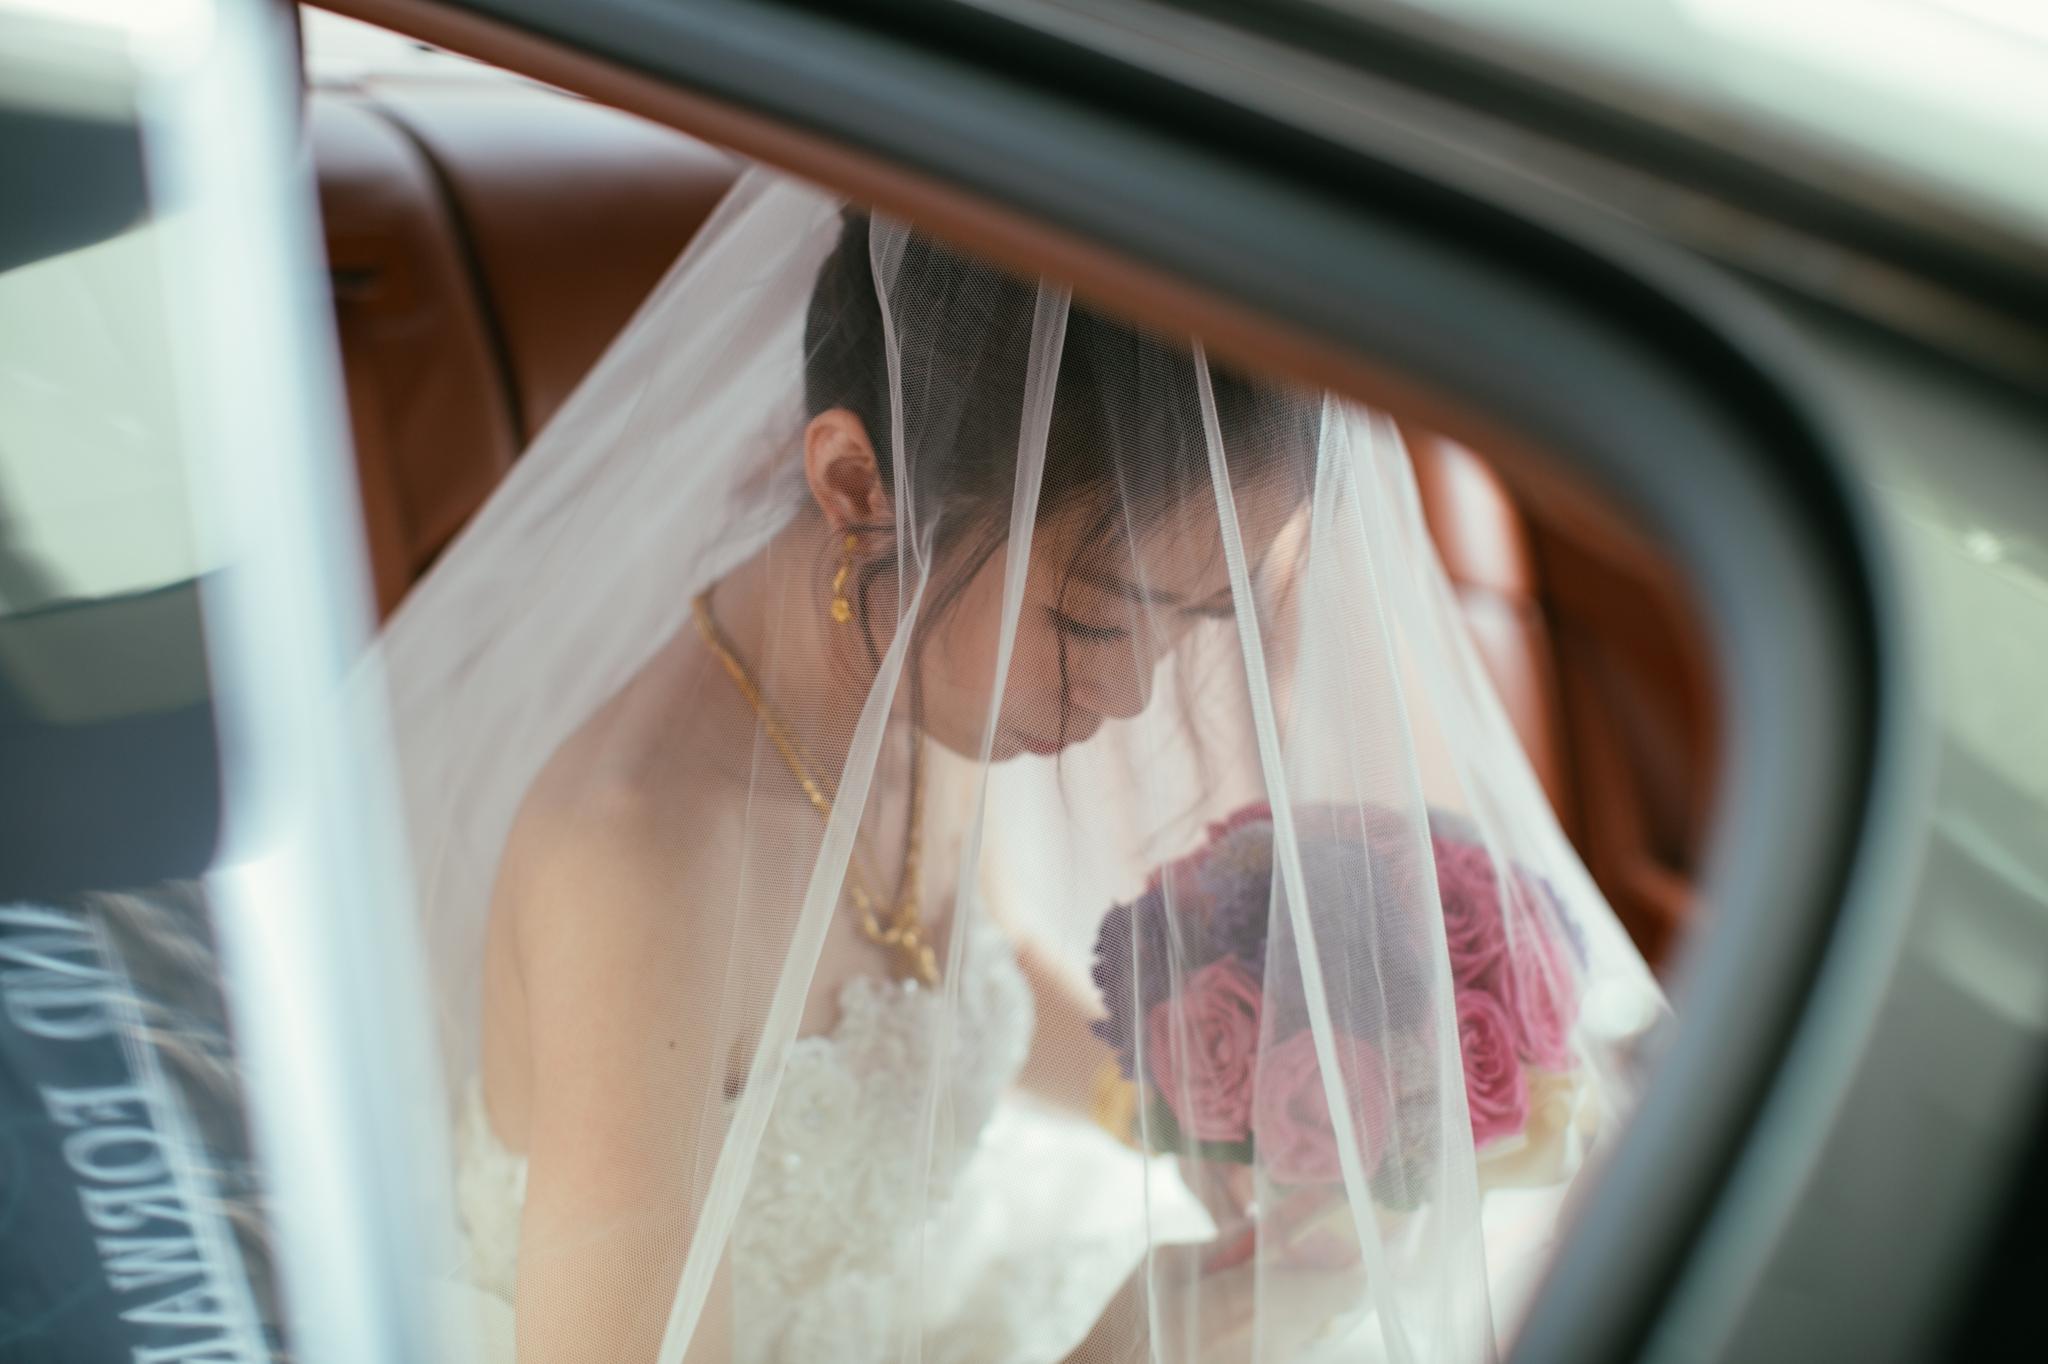 Tina+Nash-wedding-台北婚禮迎娶晚宴-新莊終身大事-076.jpg